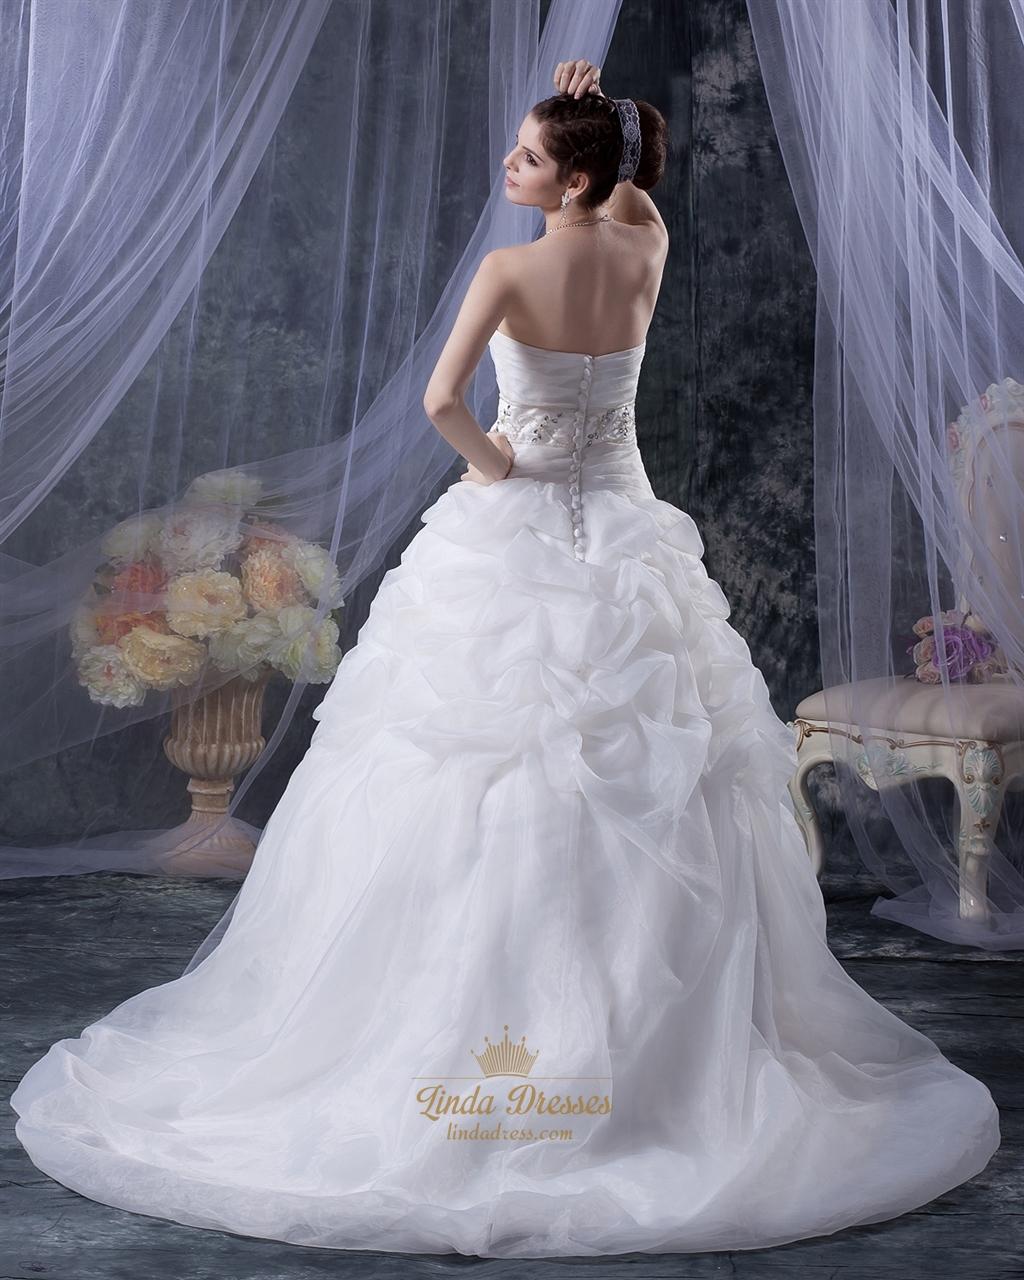 White Sweetheart Dropped Waist Applique Tulle Wedding